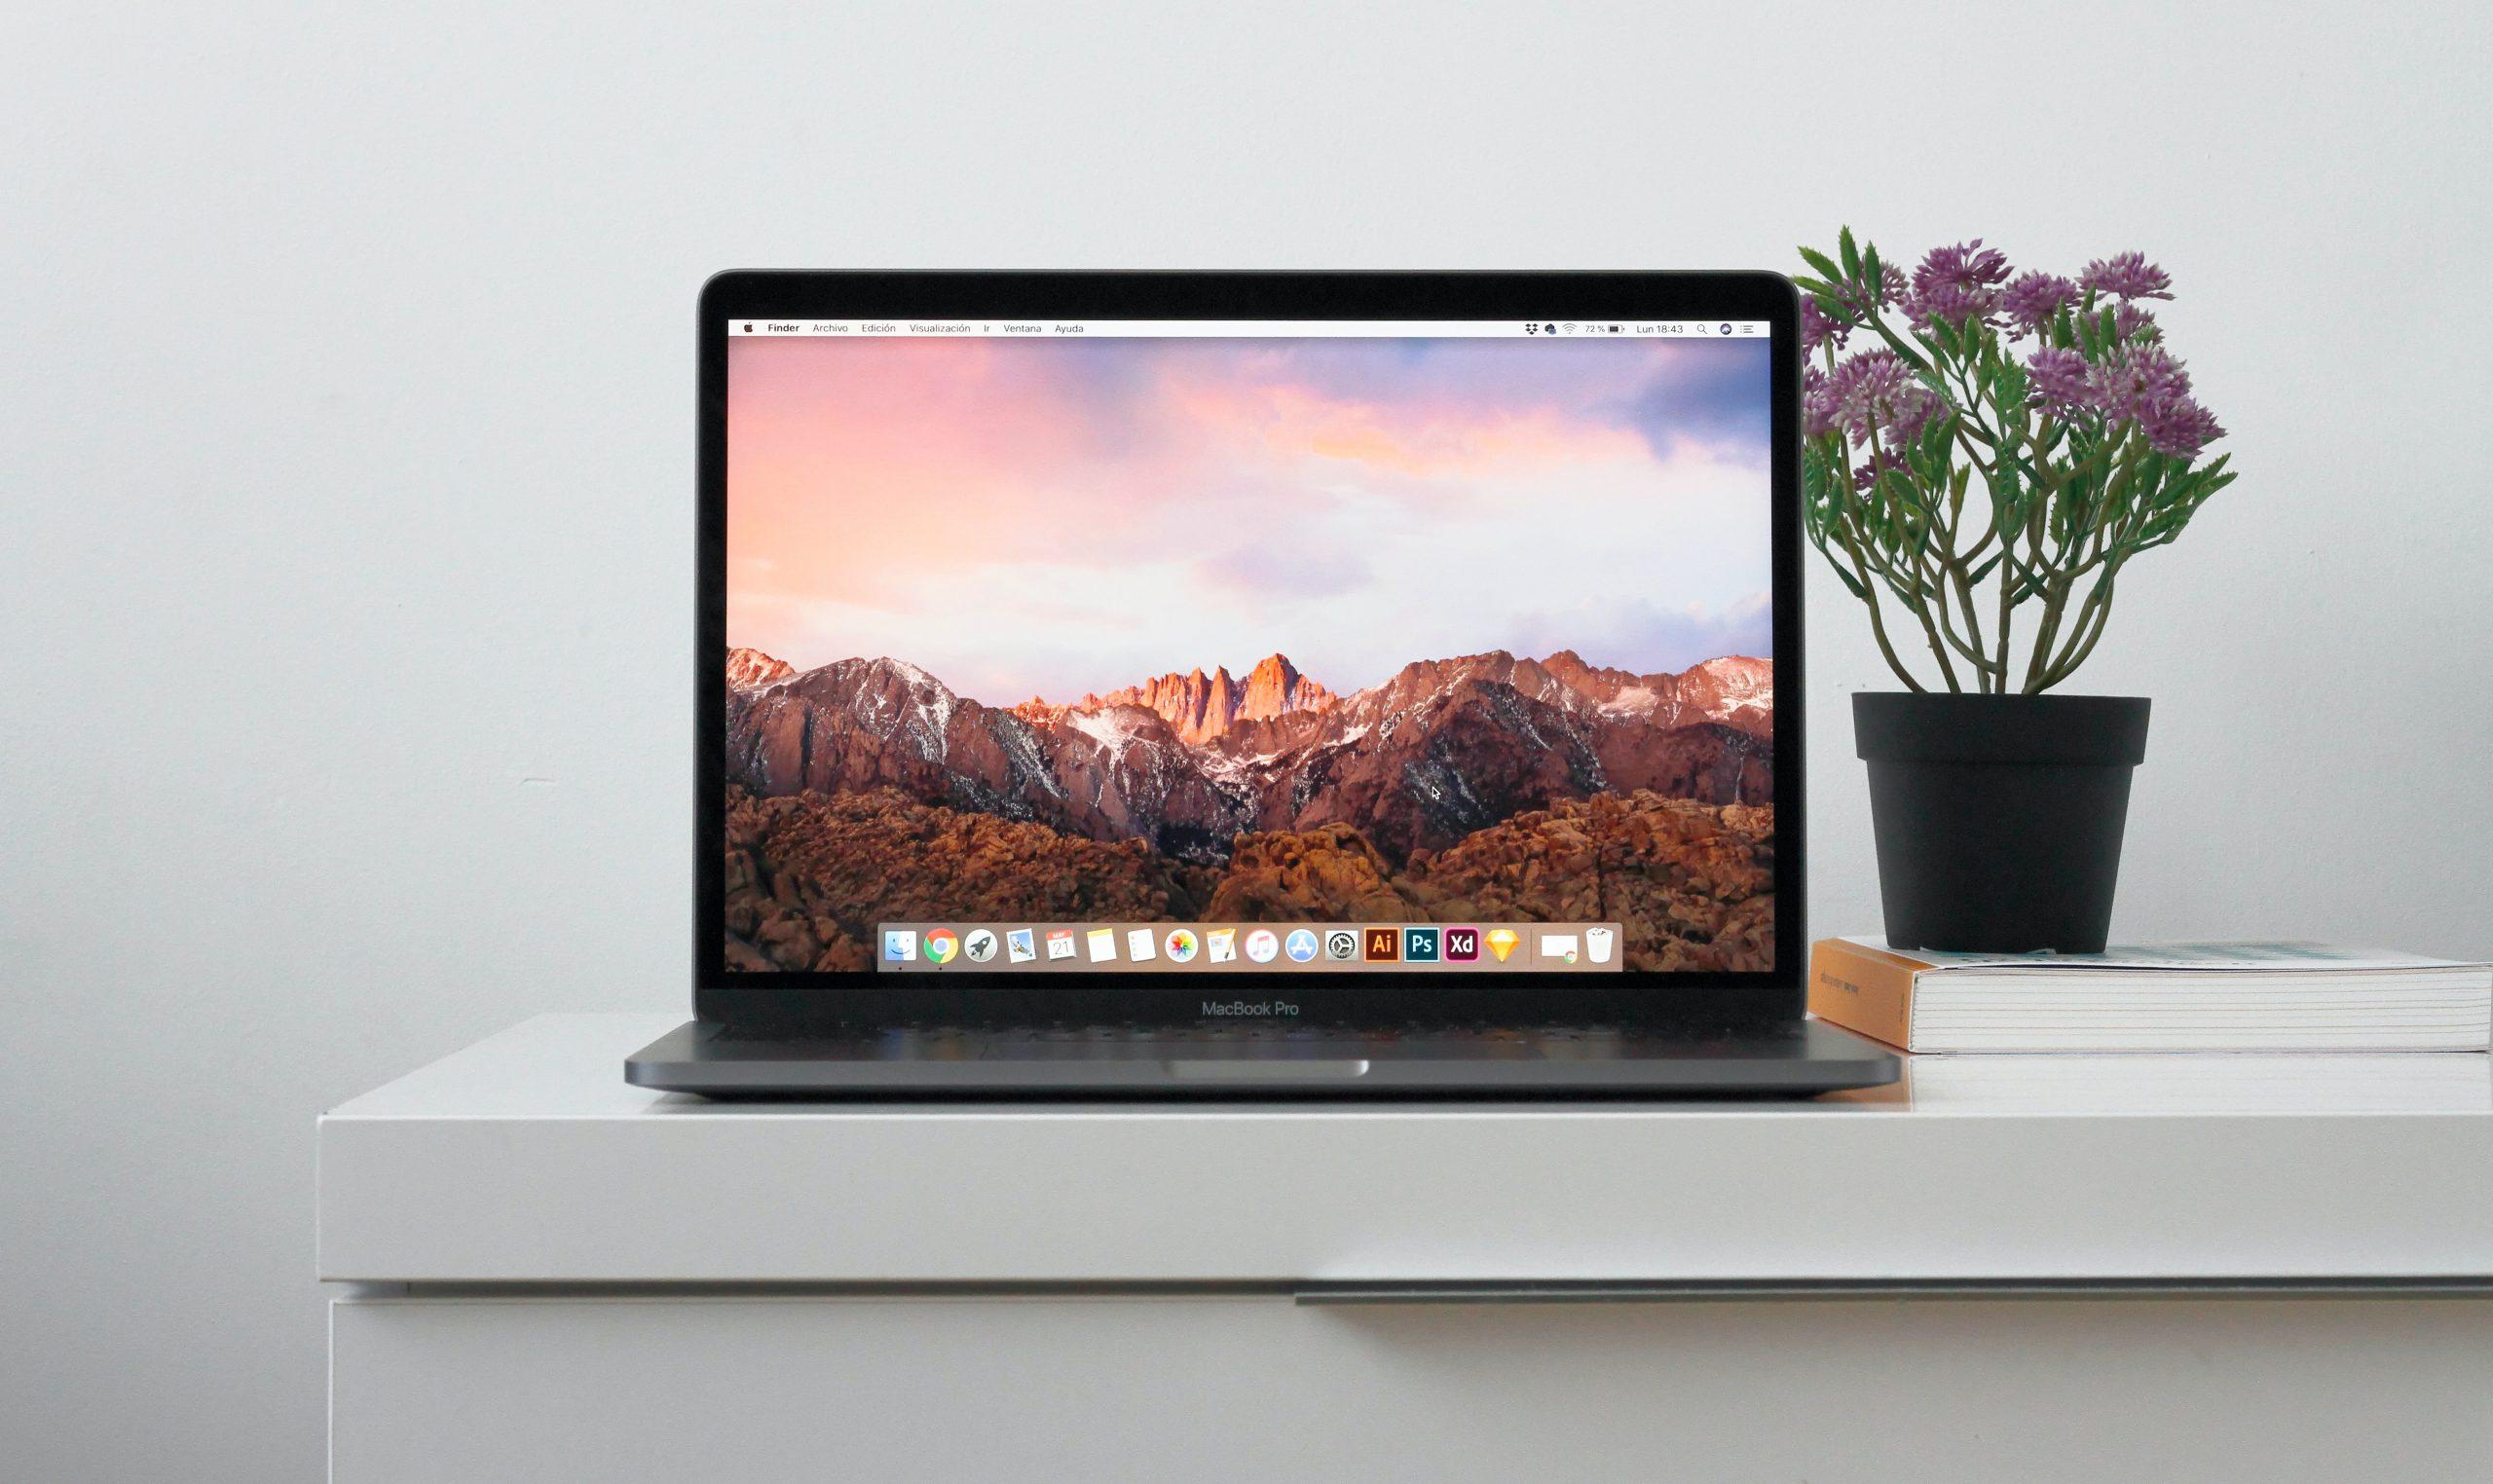 mac has better built-in security